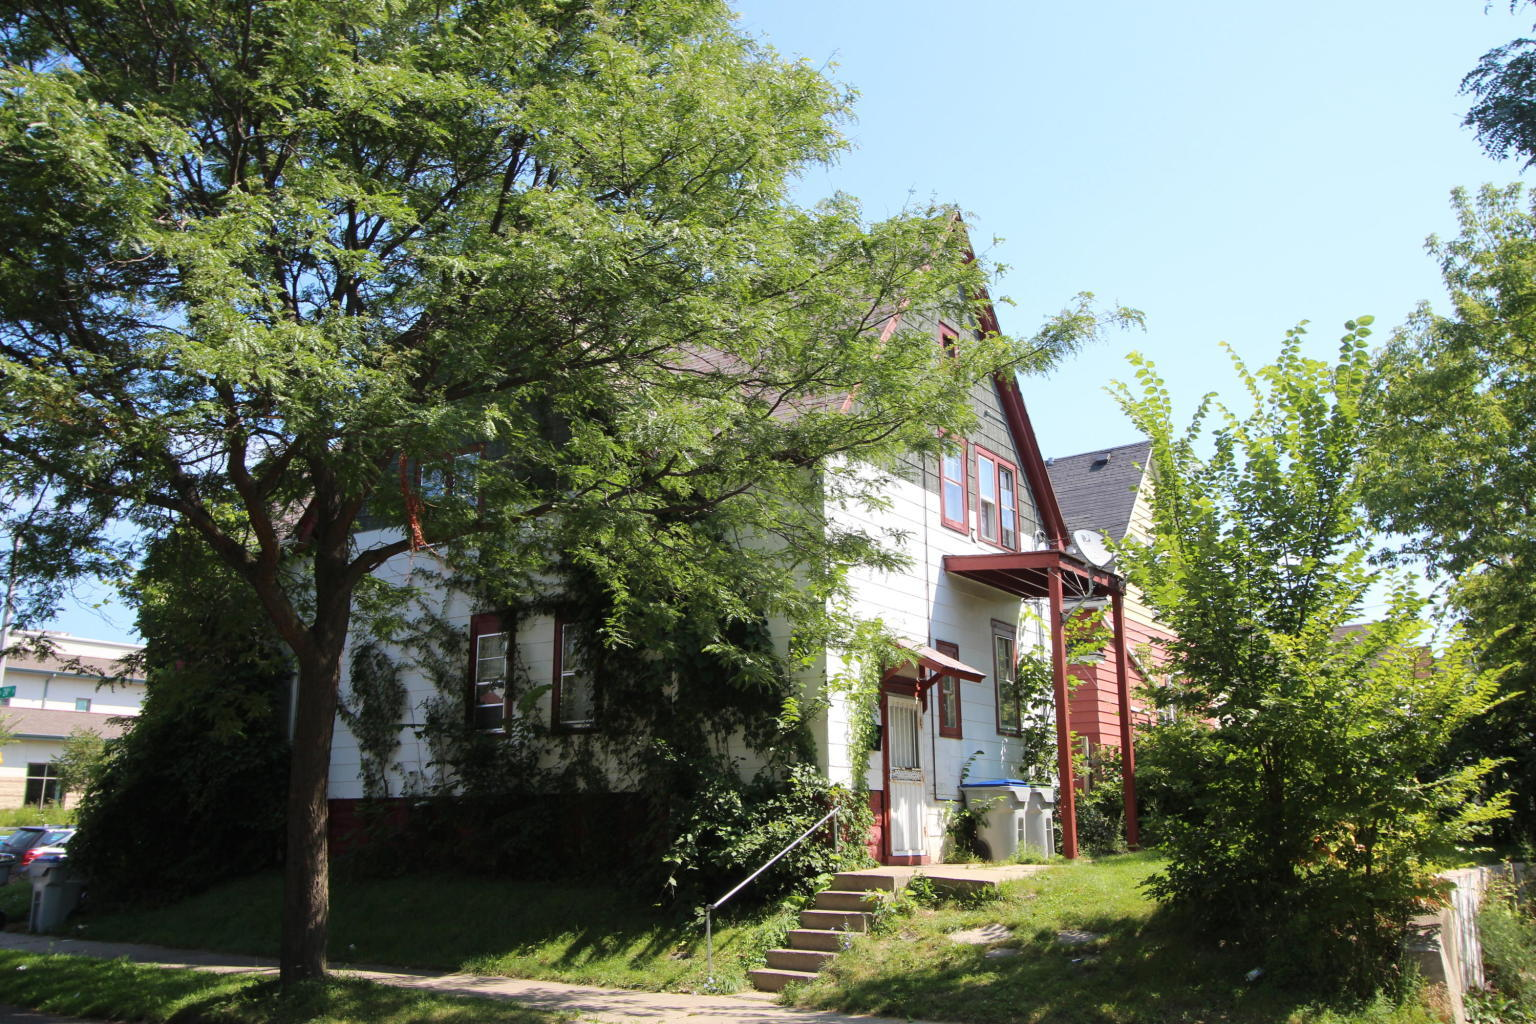 2335 Burleigh St, Milwaukee, Wisconsin 53206, 2 Bedrooms Bedrooms, 5 Rooms Rooms,1 BathroomBathrooms,Two-Family,For Sale,Burleigh St,1,1643409